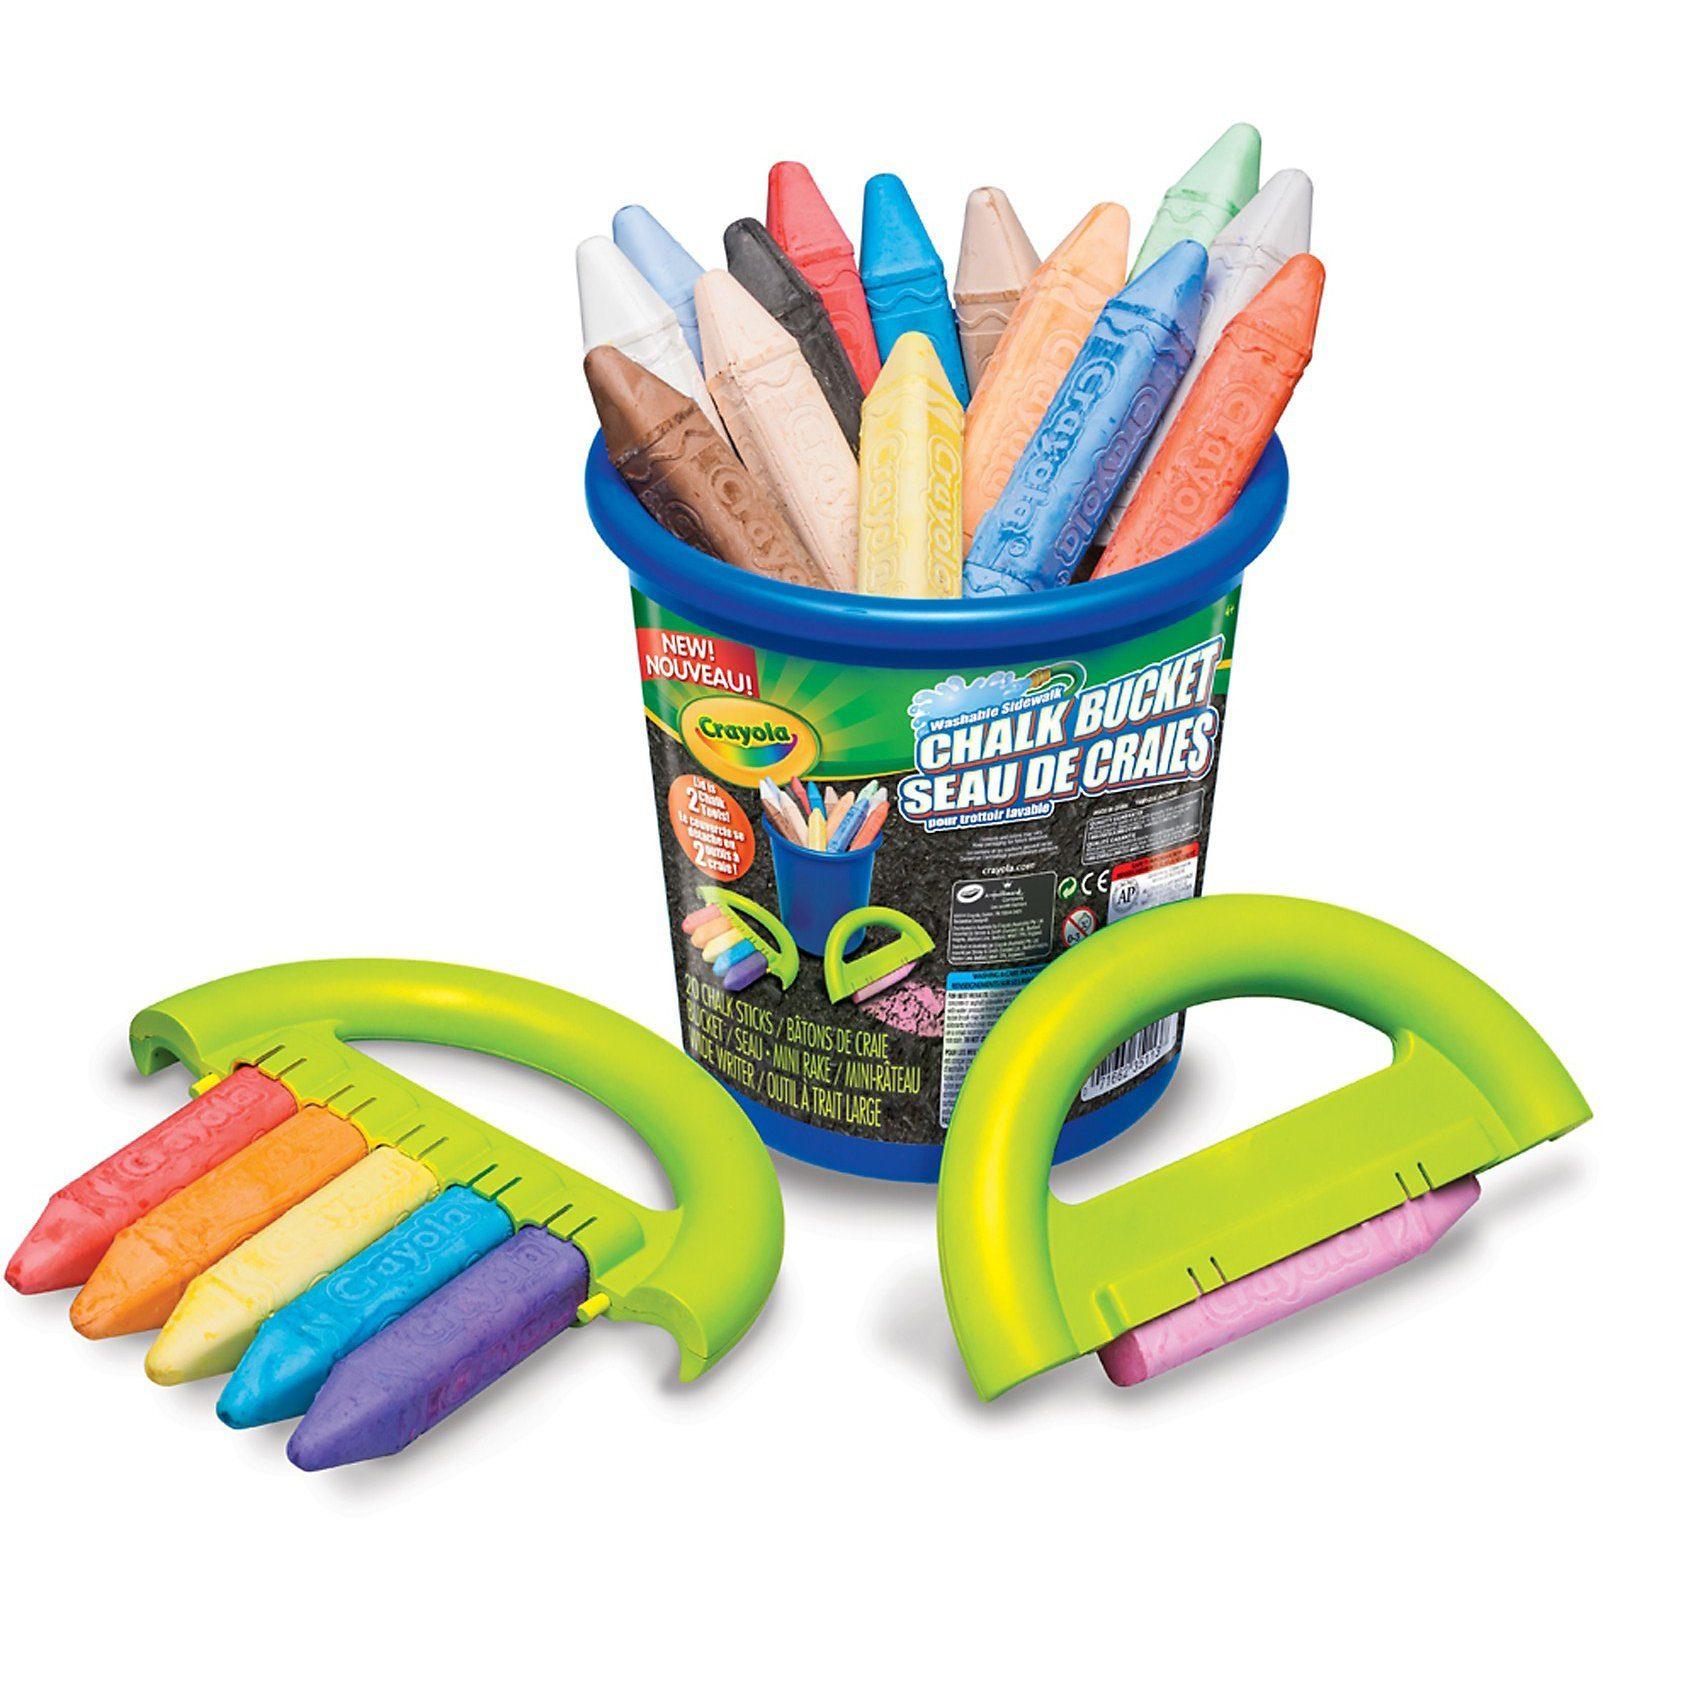 Crayola Straßenkreide, 20 Farben inkl. Halter